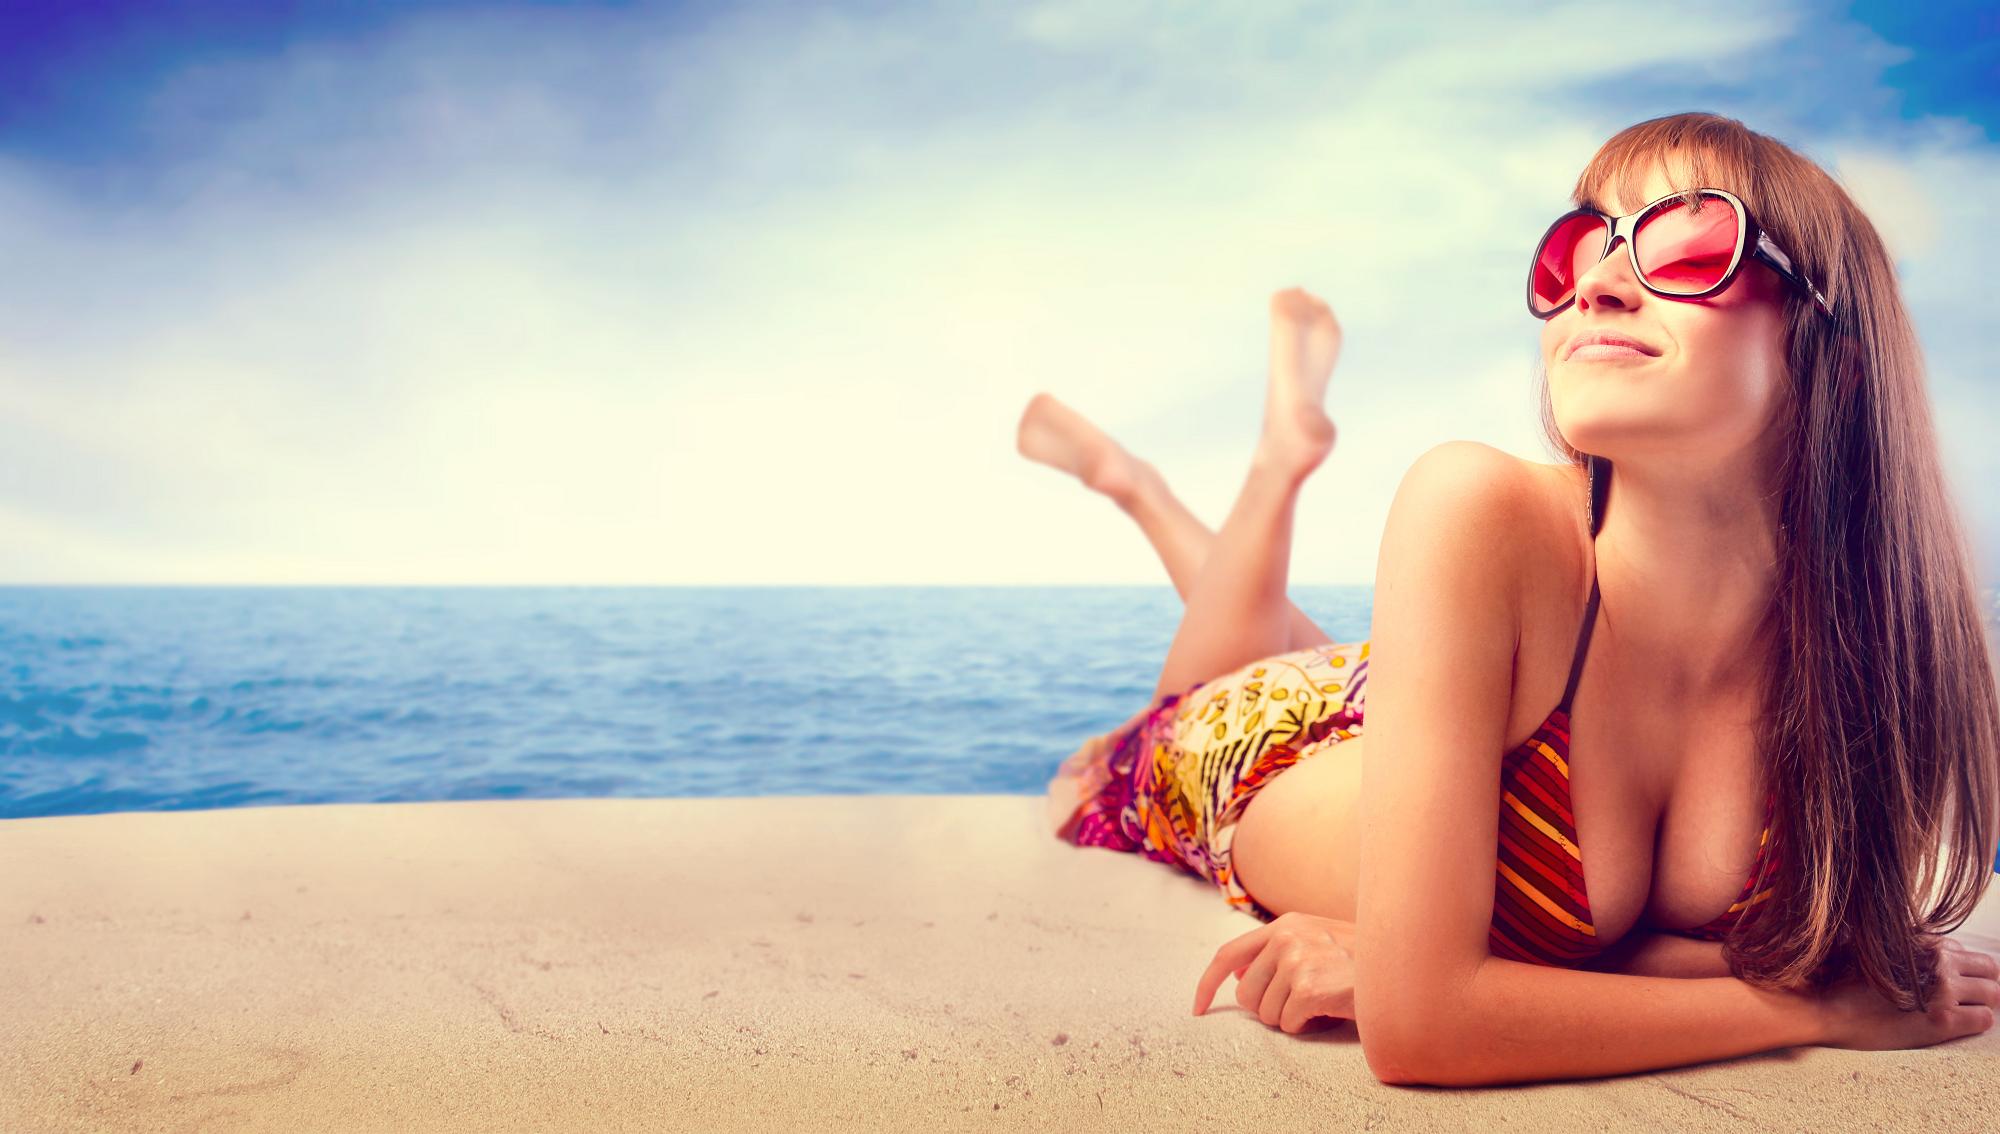 beach-body.png